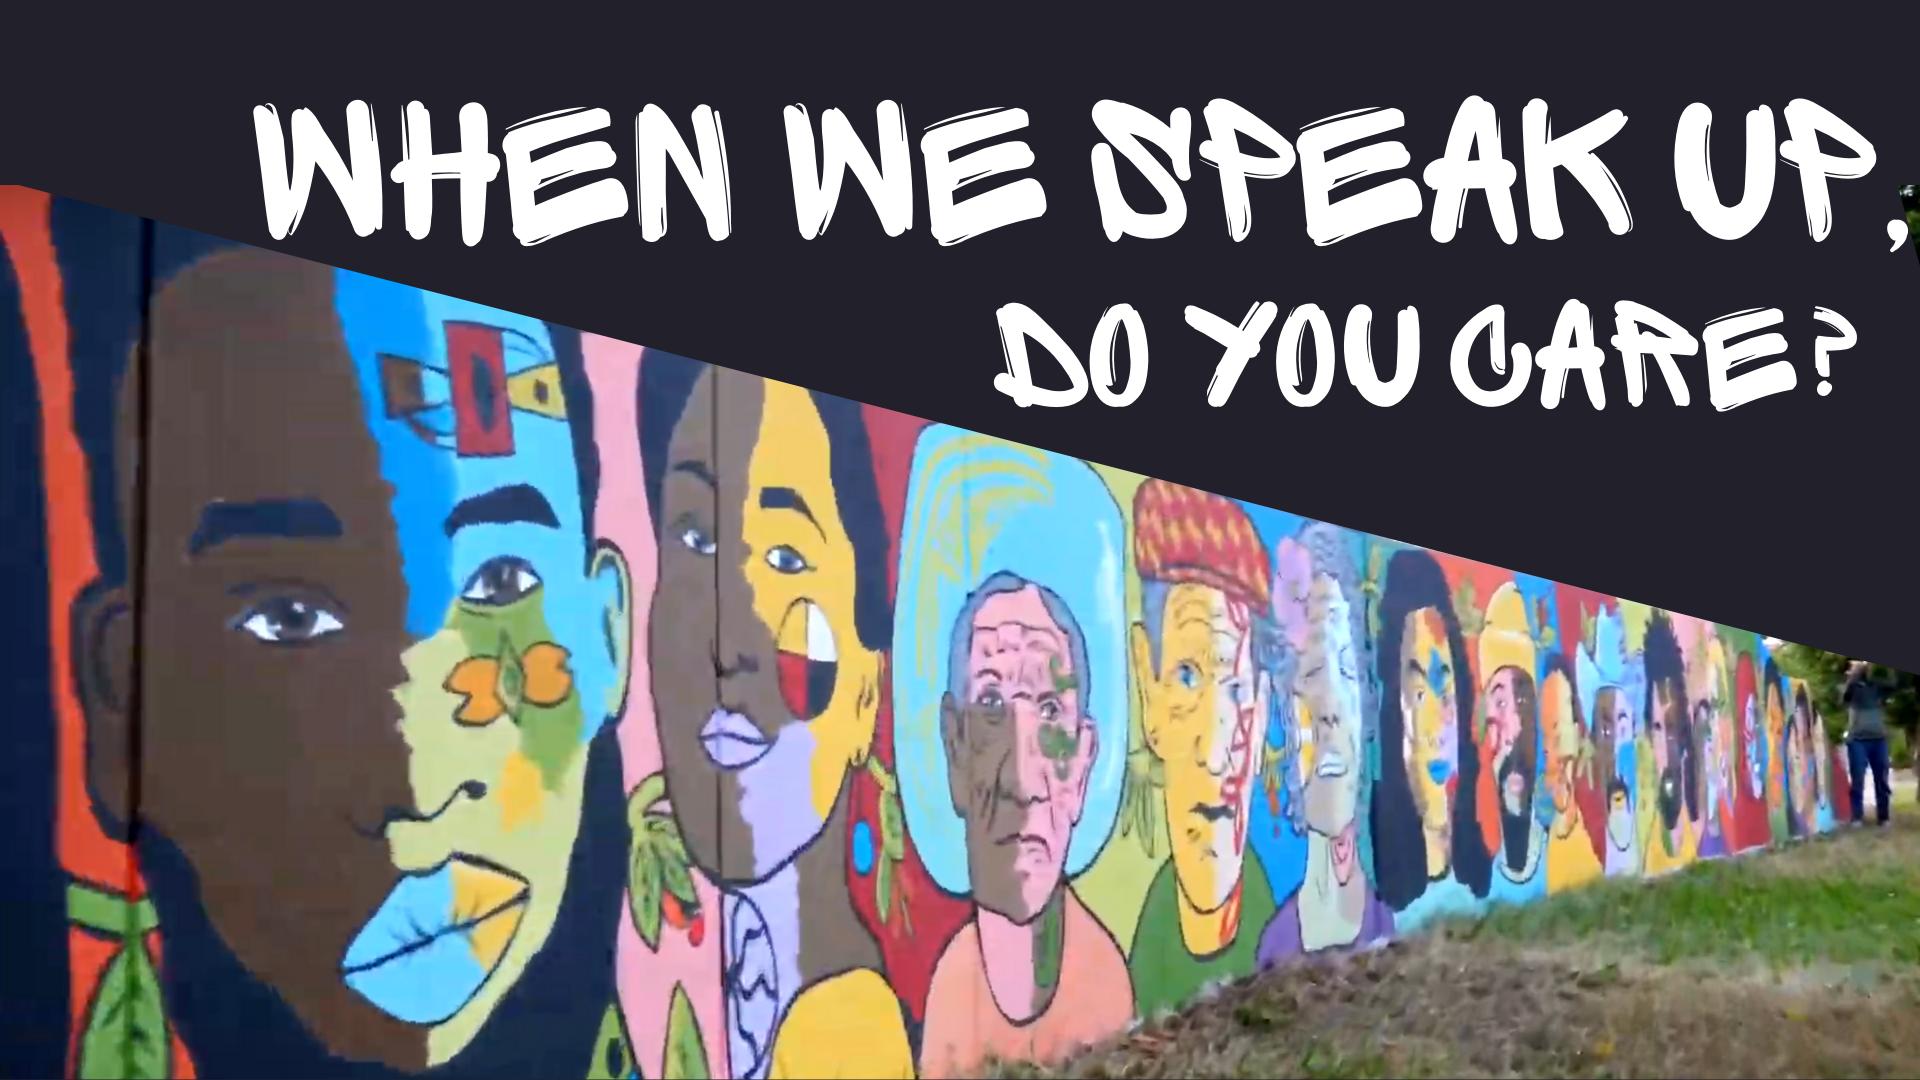 west side mural when we speak up